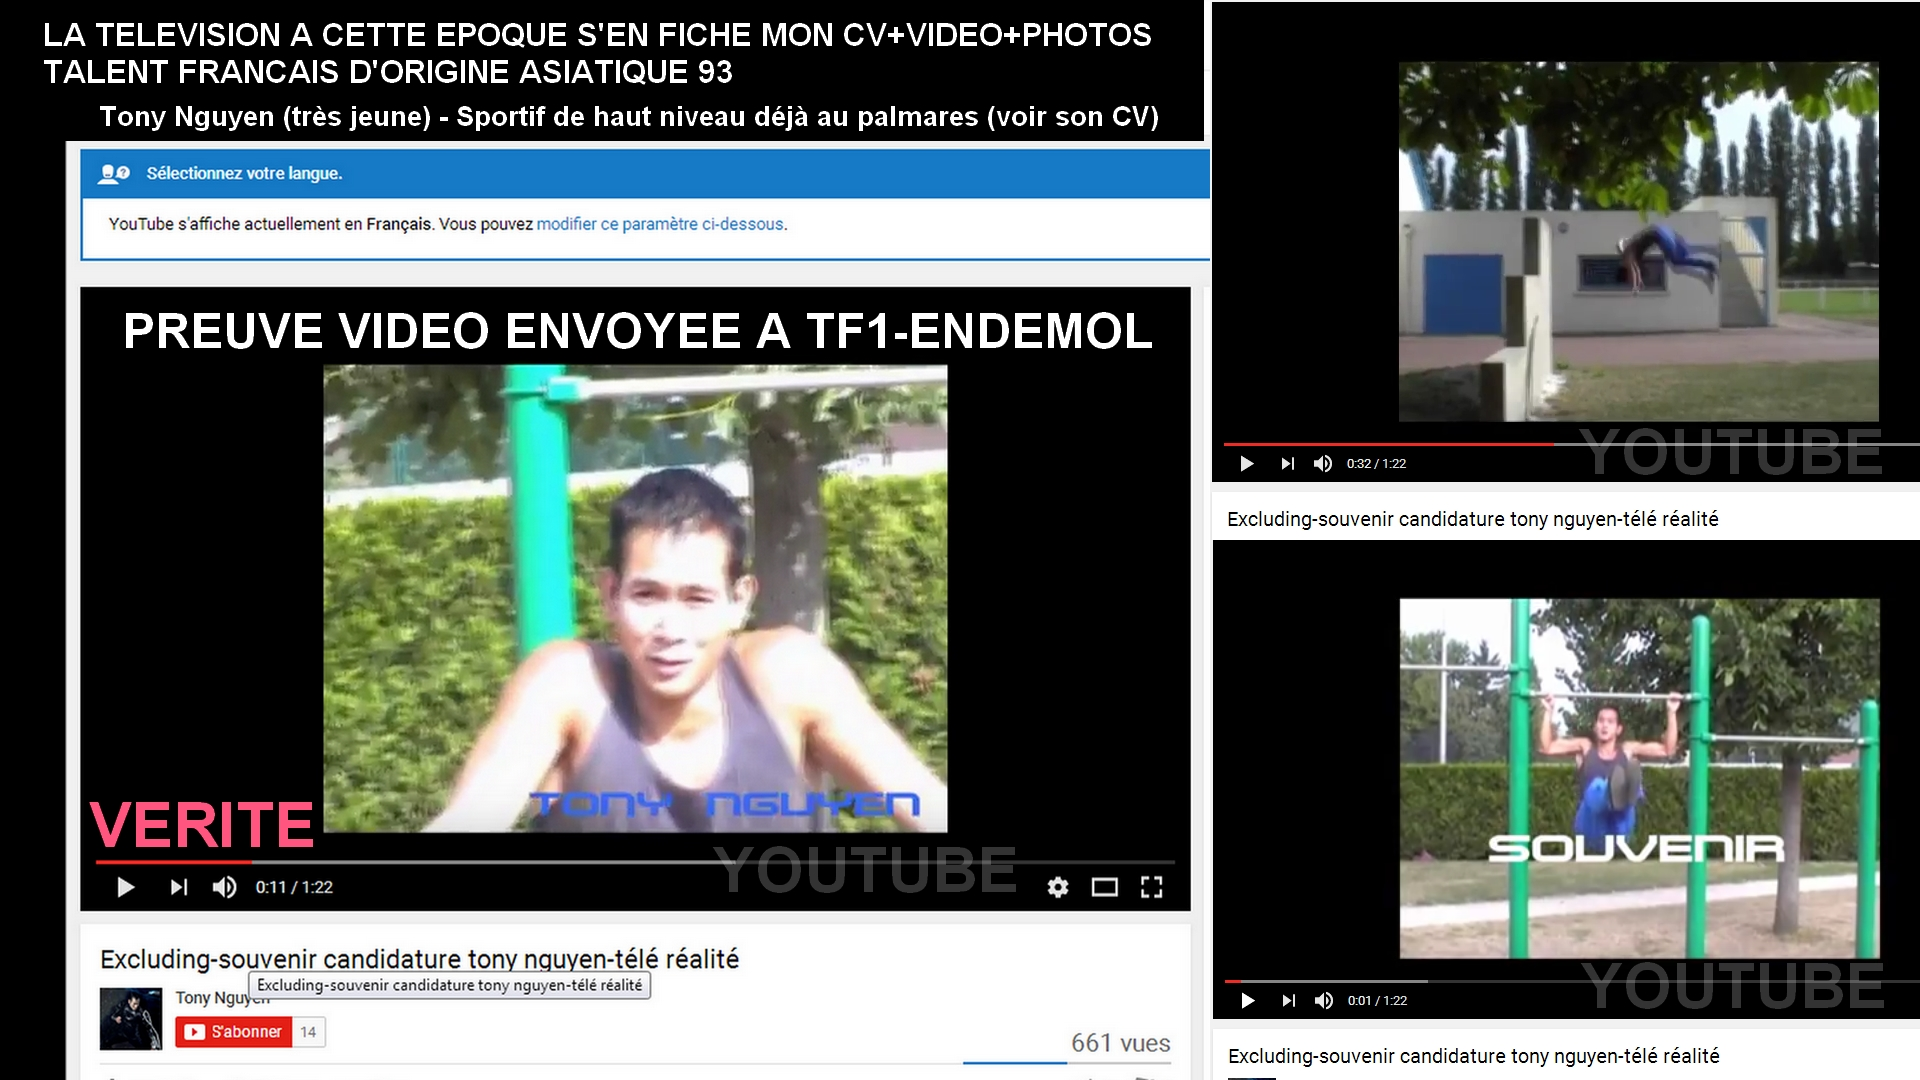 Excludingvideo tonynguyen candidaturevideotelerealite racismeanti asiatiquesenfrance